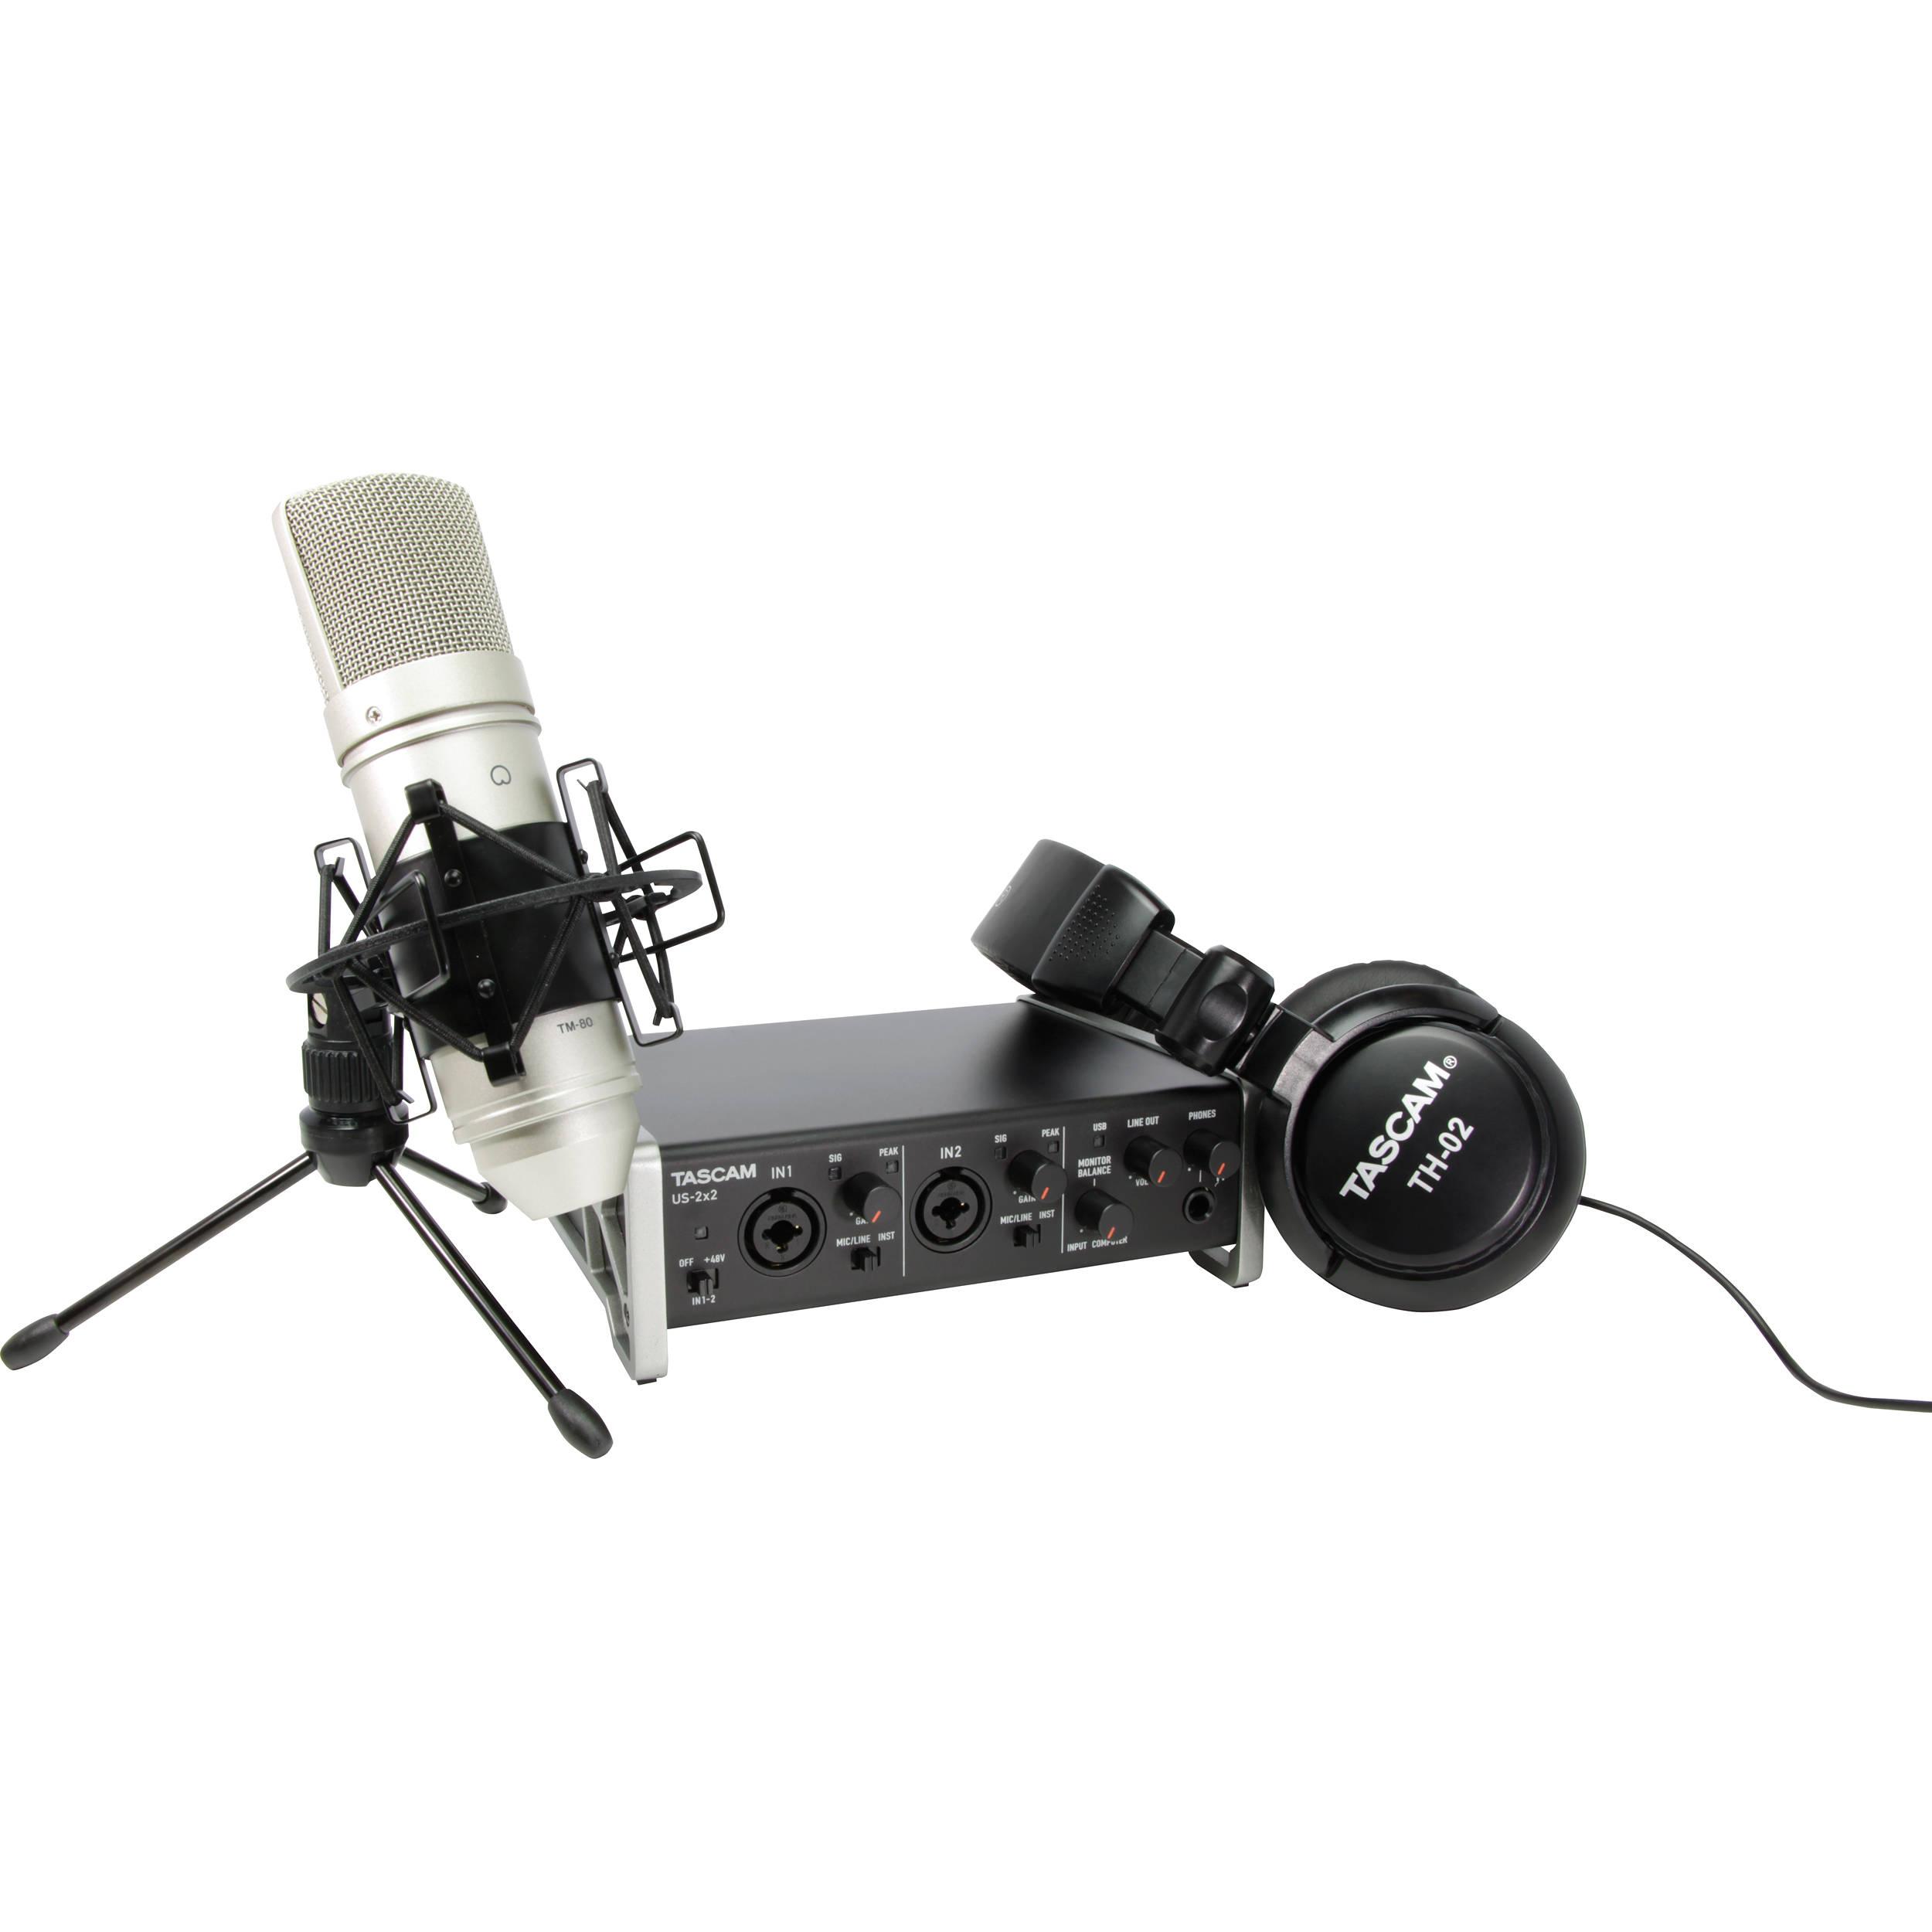 Pack de grabación home